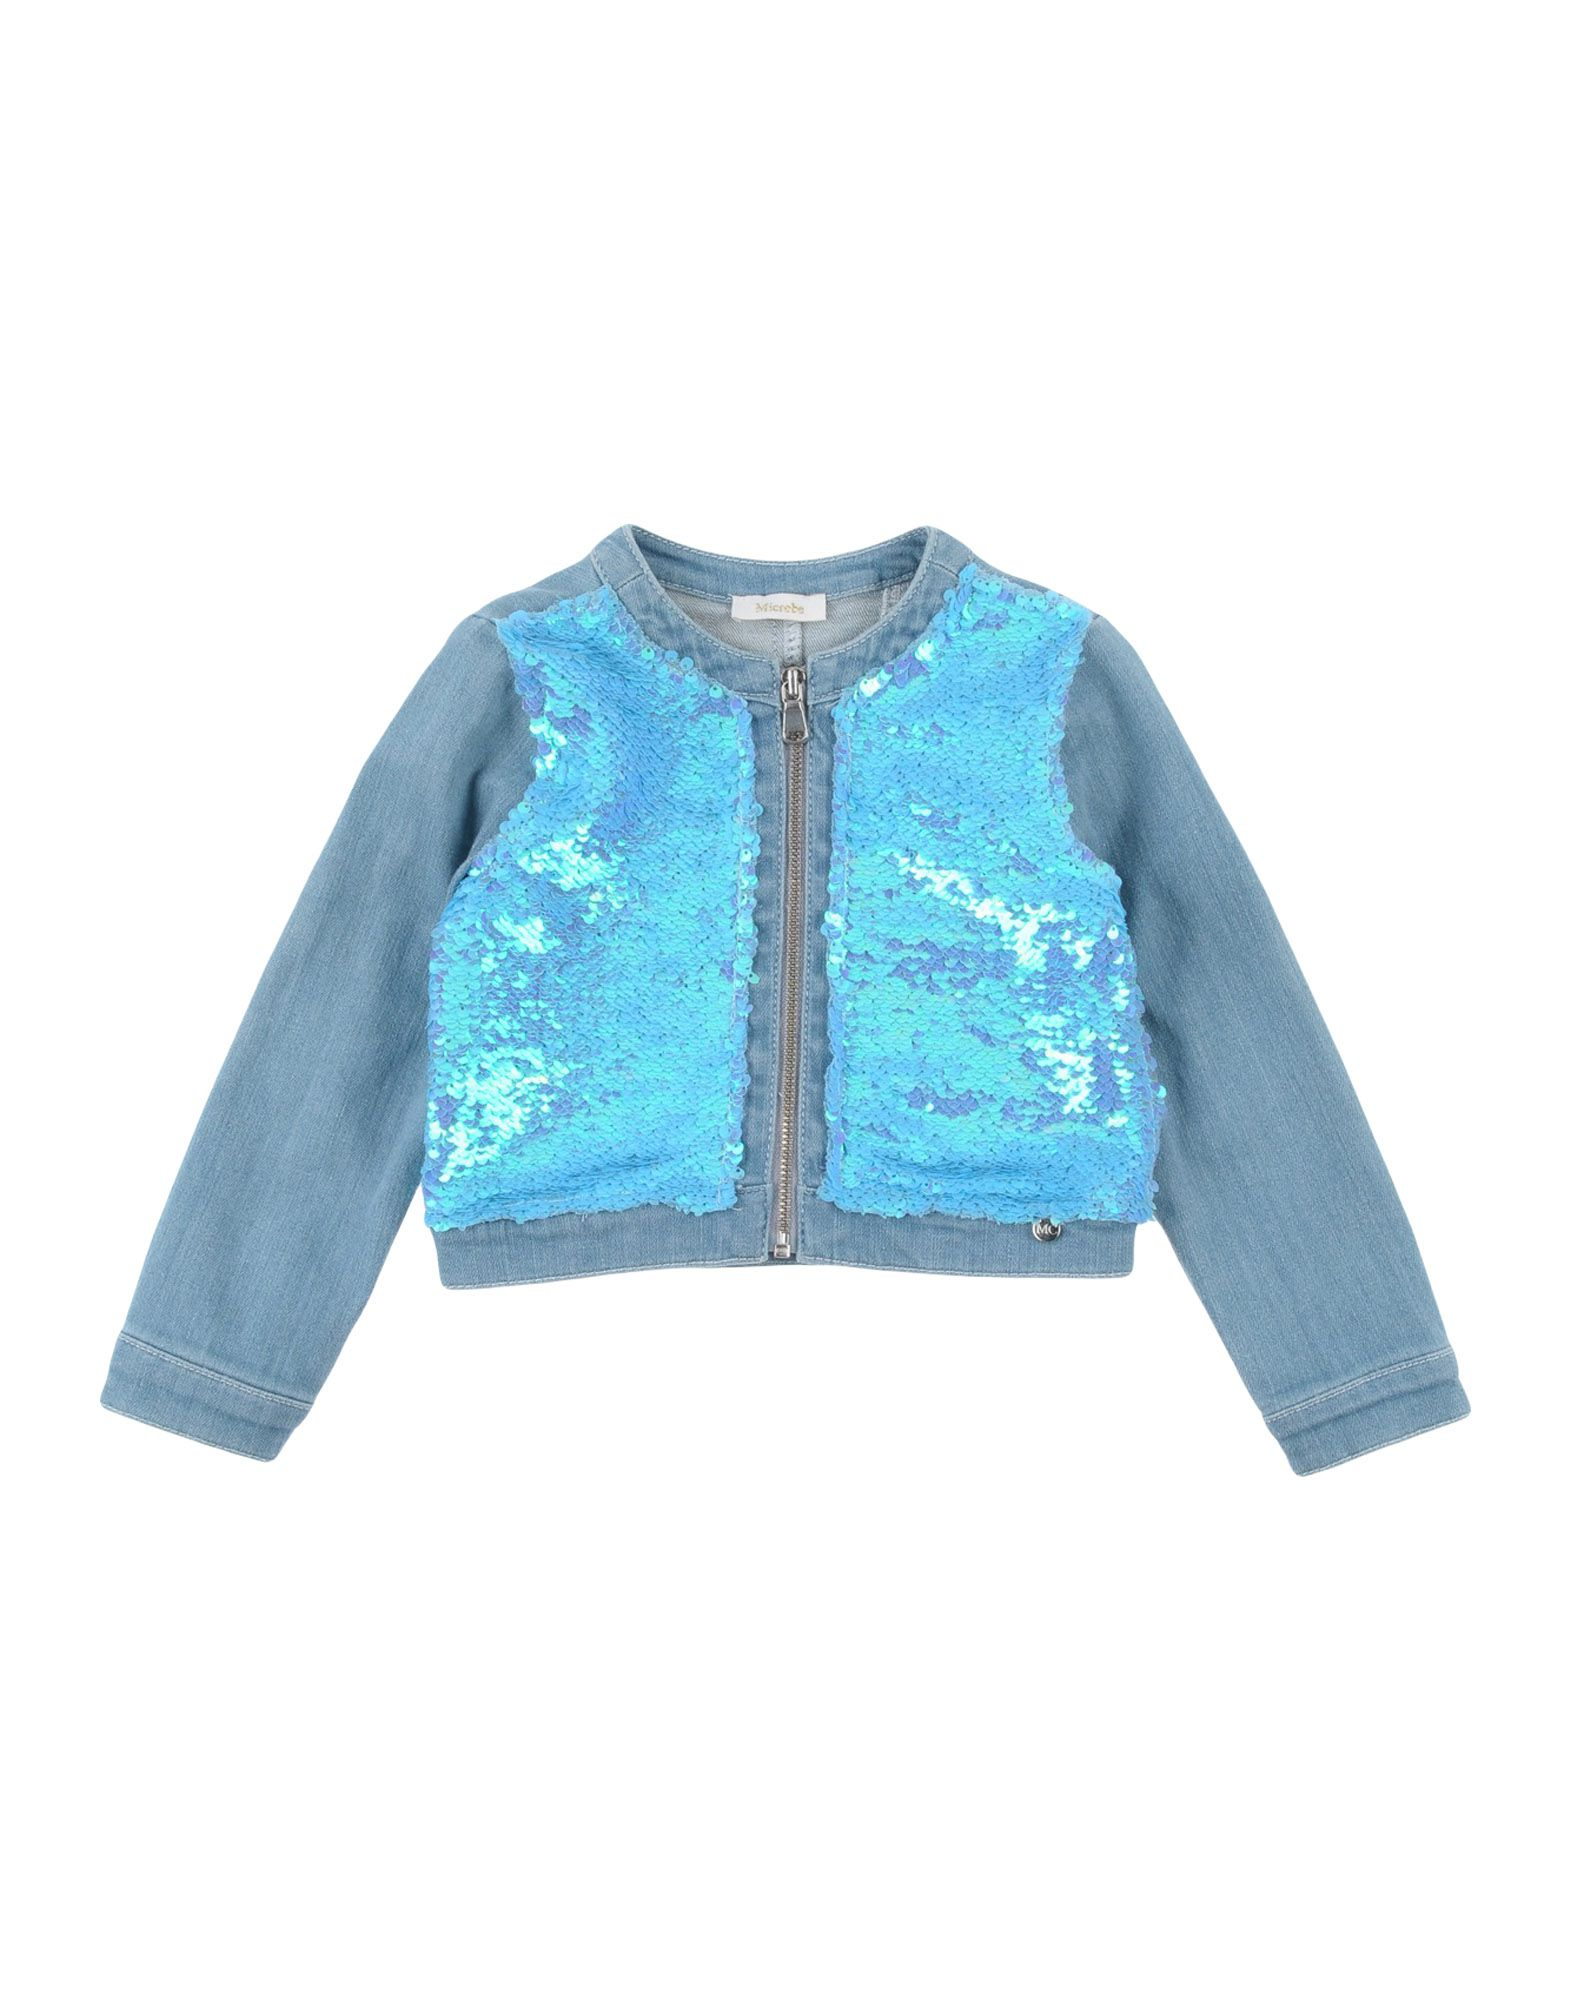 Фото - MICROBE by MISS GRANT Джинсовая верхняя одежда microbe by miss grant джинсовая верхняя одежда